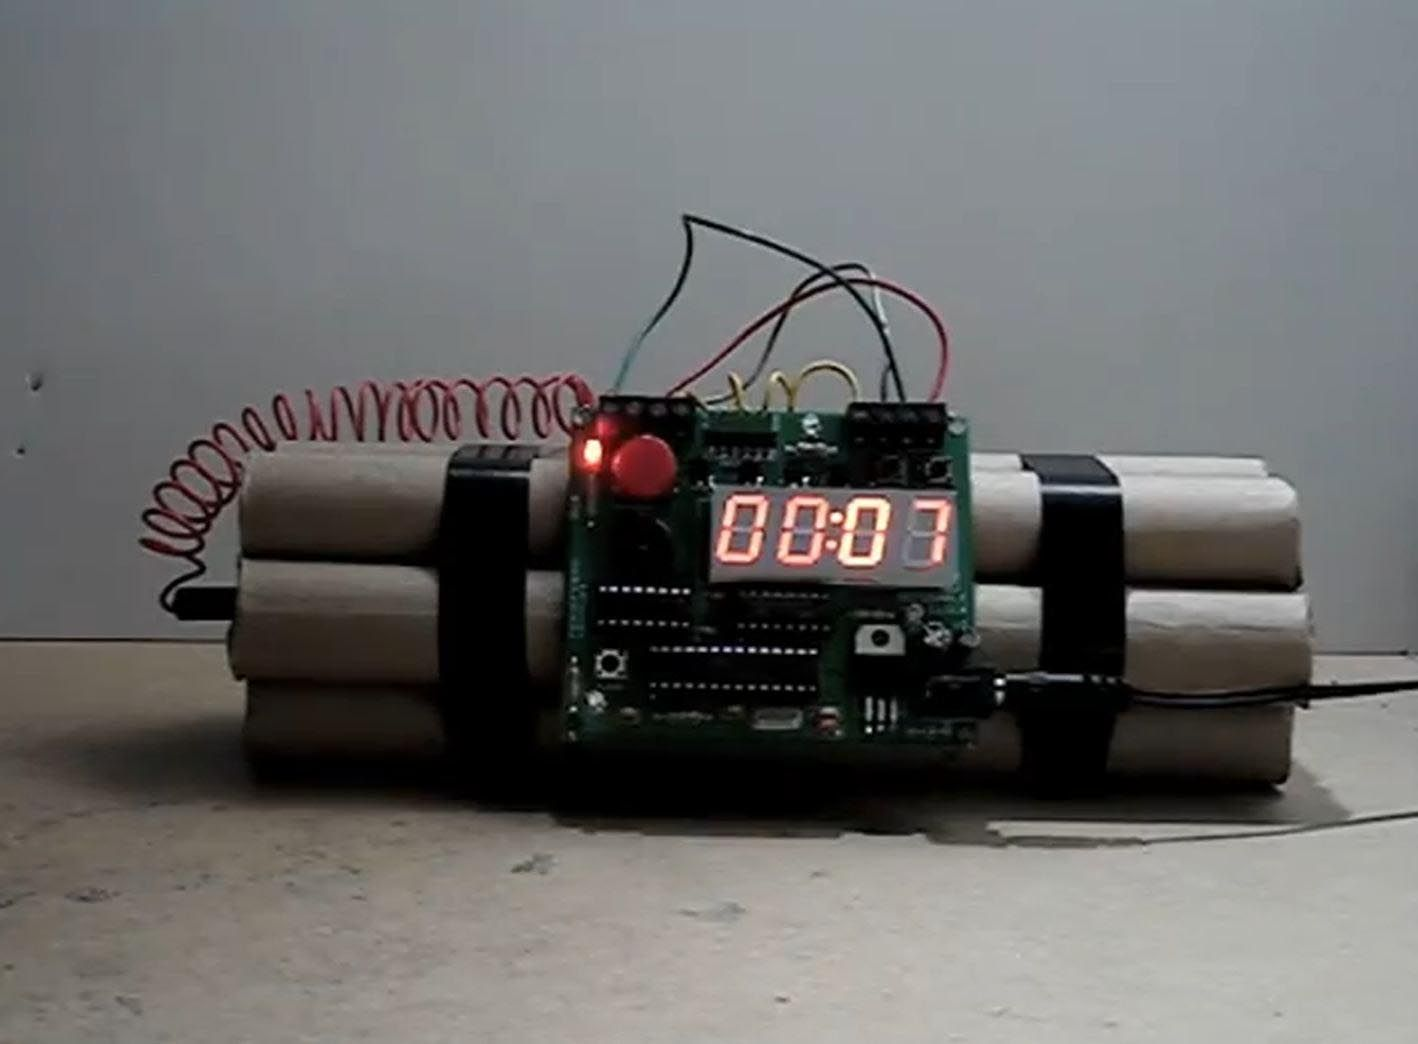 Cool Digital Alarm Clocks | Clocks | Pinterest | Digital alarm clock